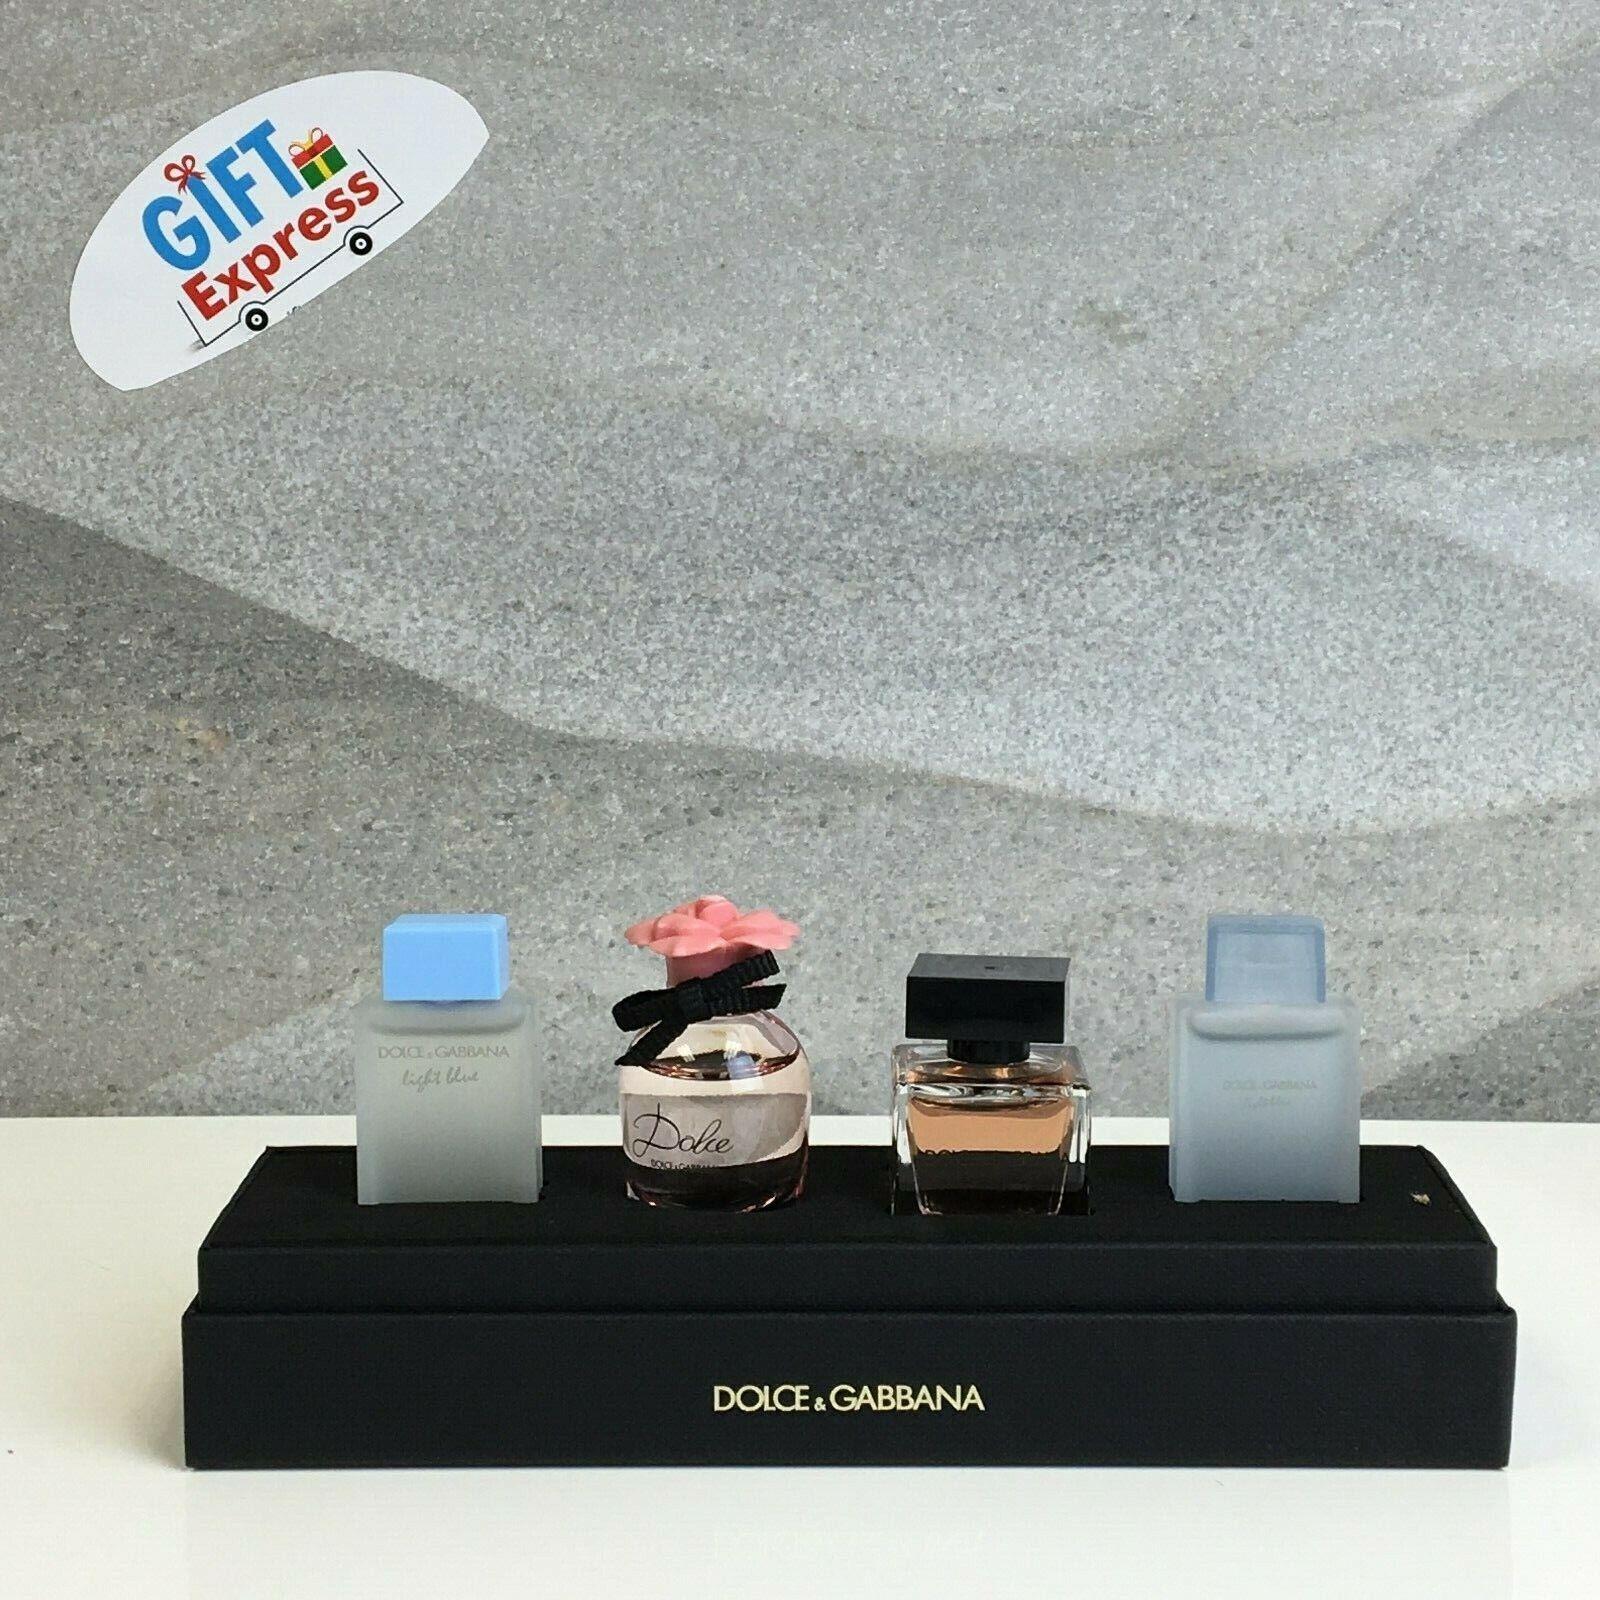 DOLCE & GABBANA for Women 4 Piece MINI Perfume Gift Set NEW